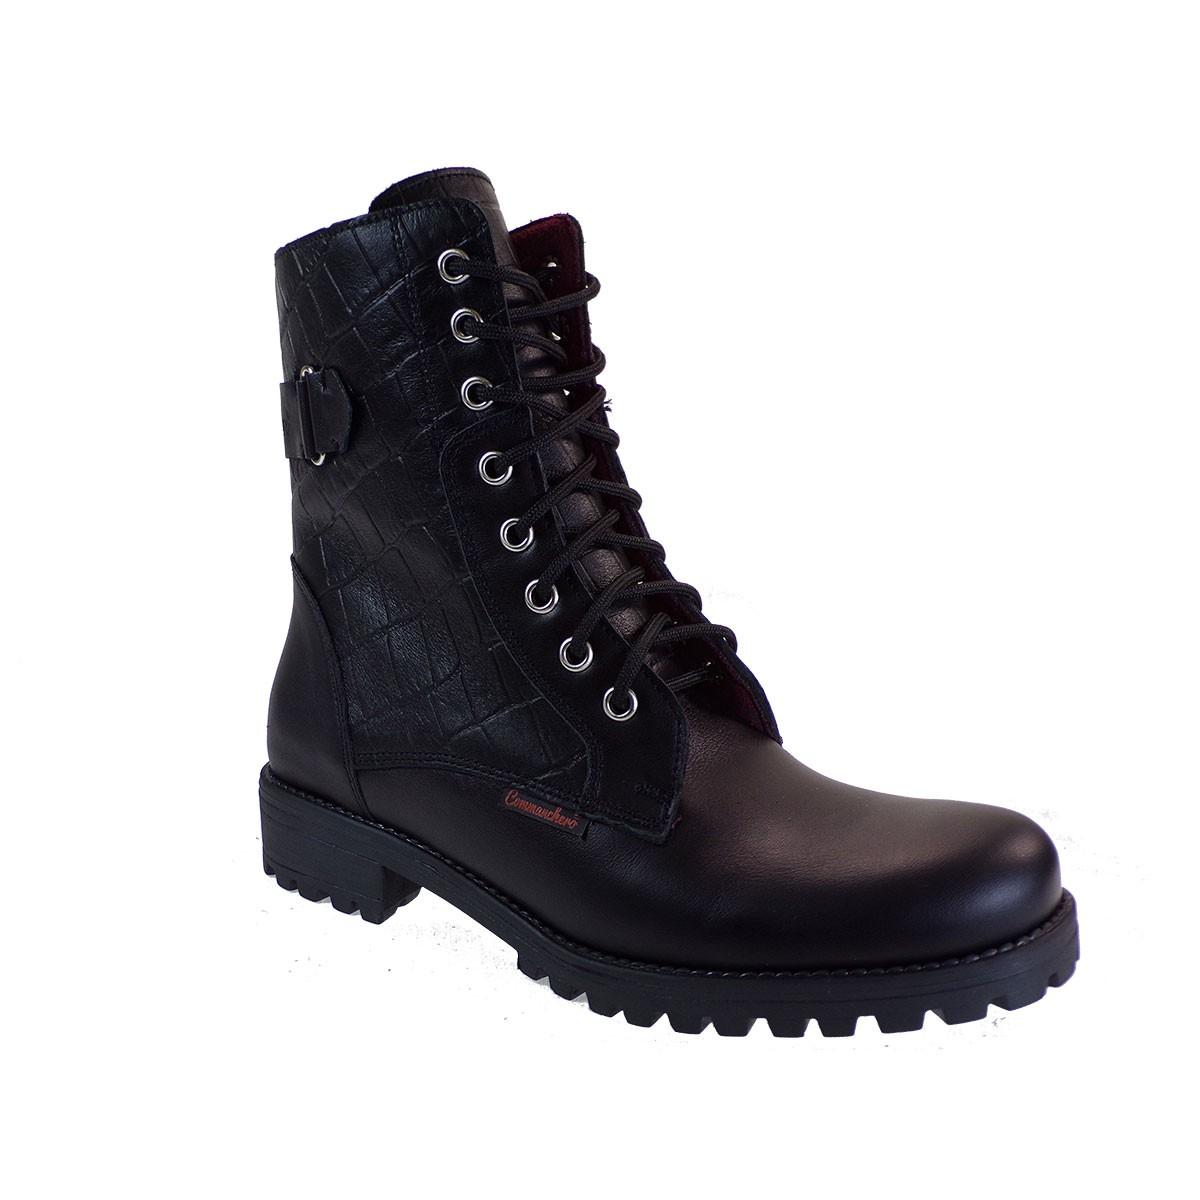 Commanchero Γυναικεία Παπούτσια Μποτάκια Αρβυλάκια 5768-721 Μαύρο Δέρμα